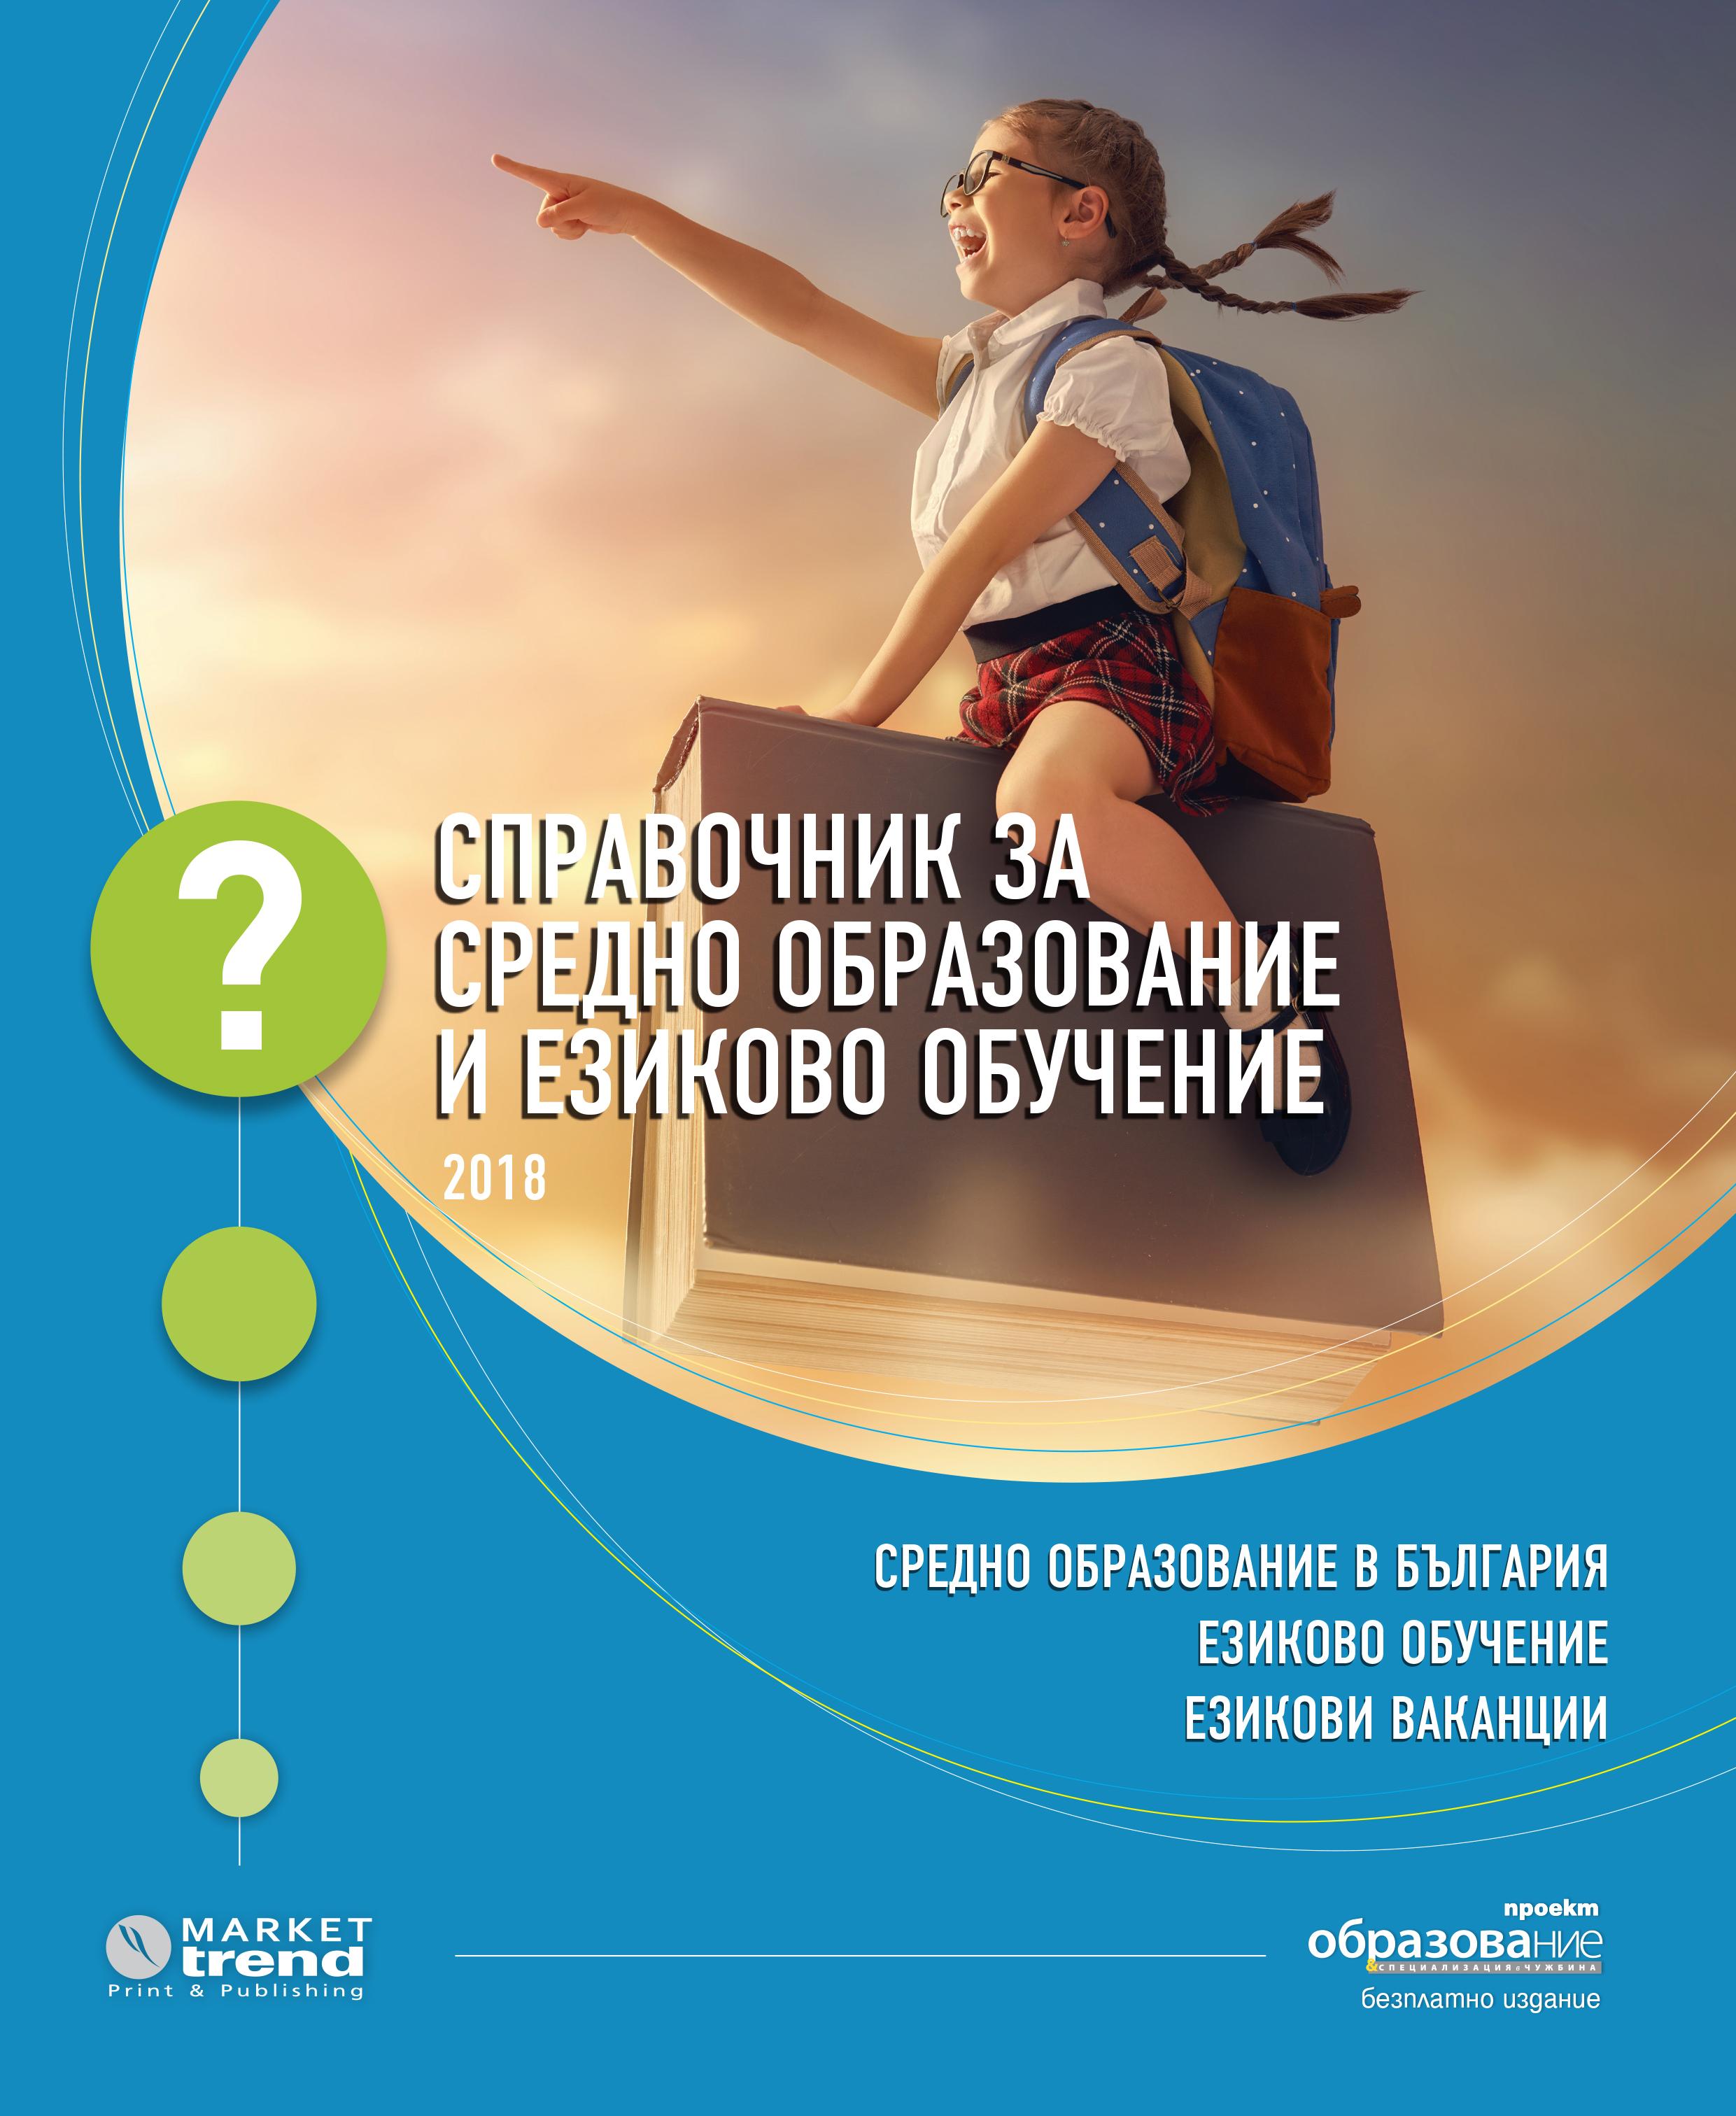 SchoolGuides-covers-BG_2018_